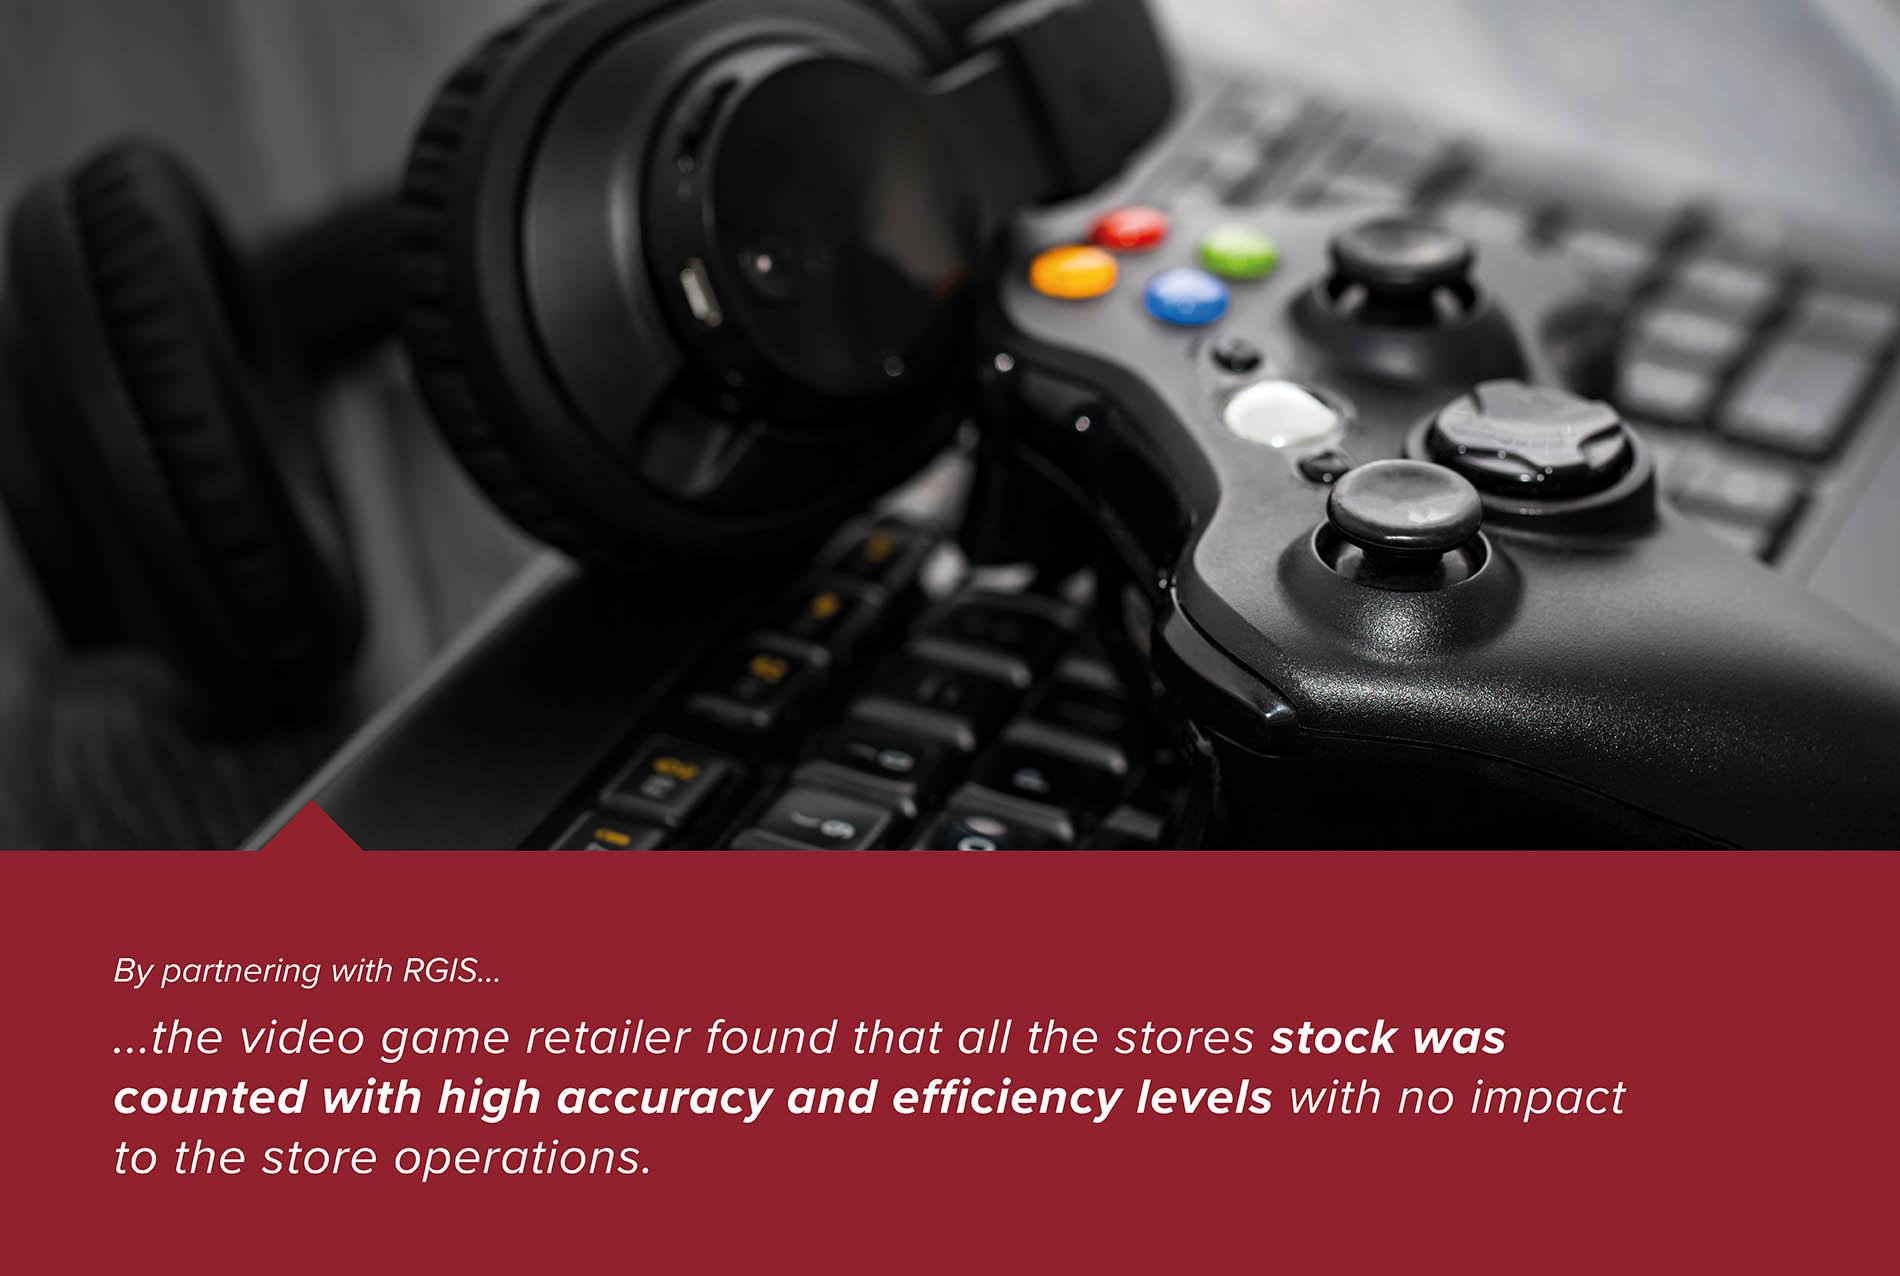 Retail Store Inventory – Video Game Retailer